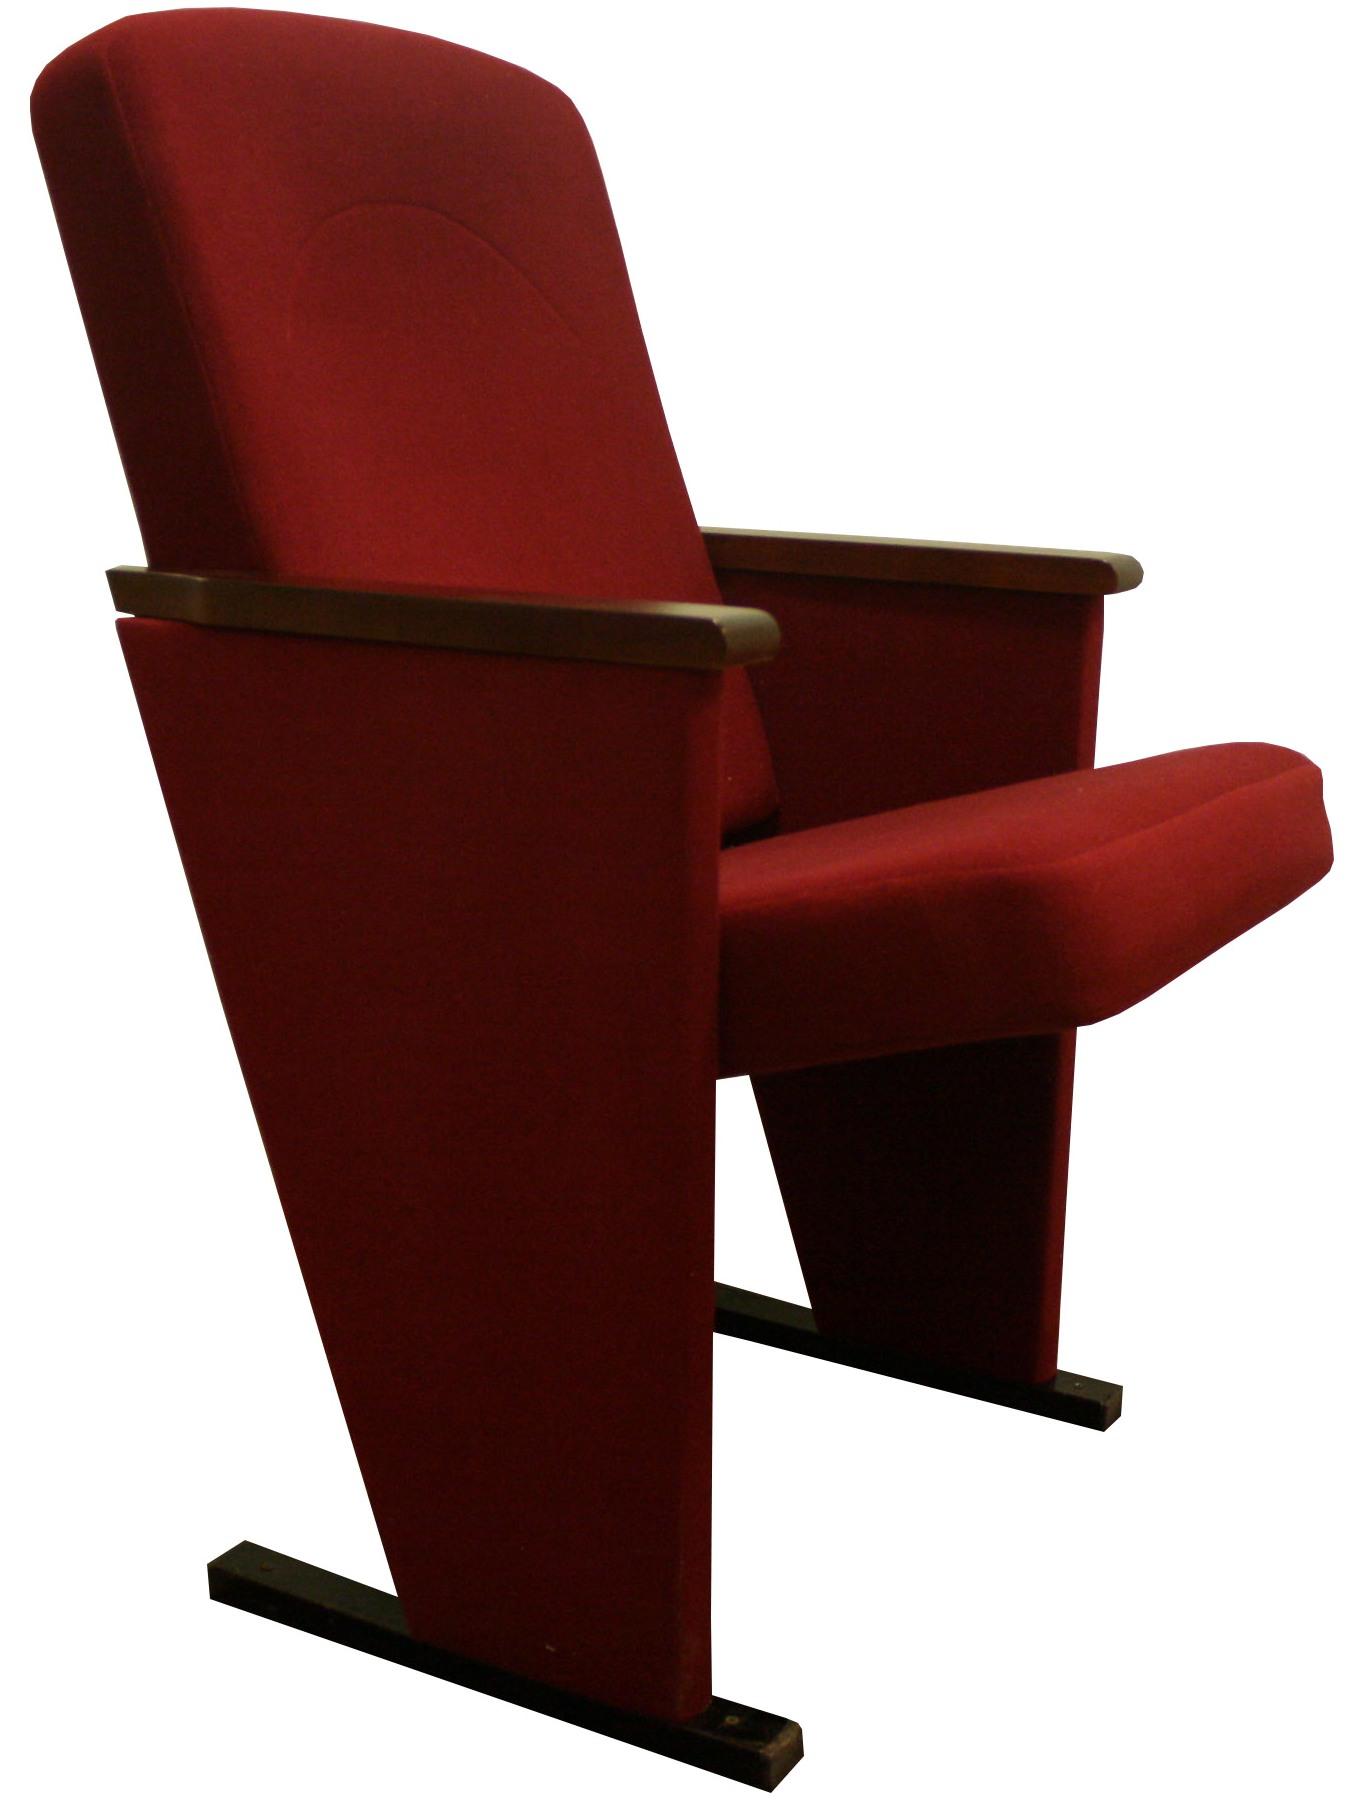 кд-113у кресла